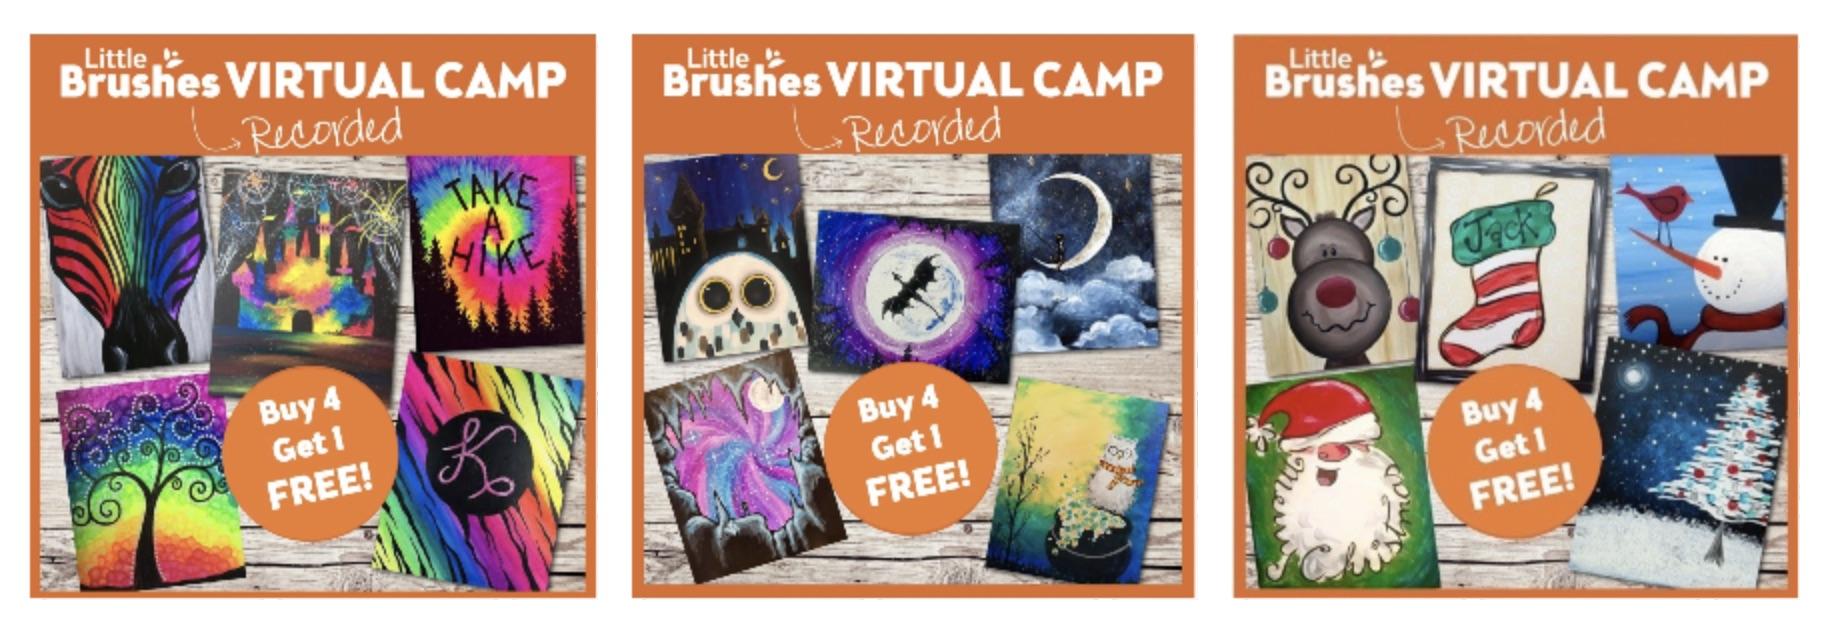 Virtual Kids Camp has arrived!